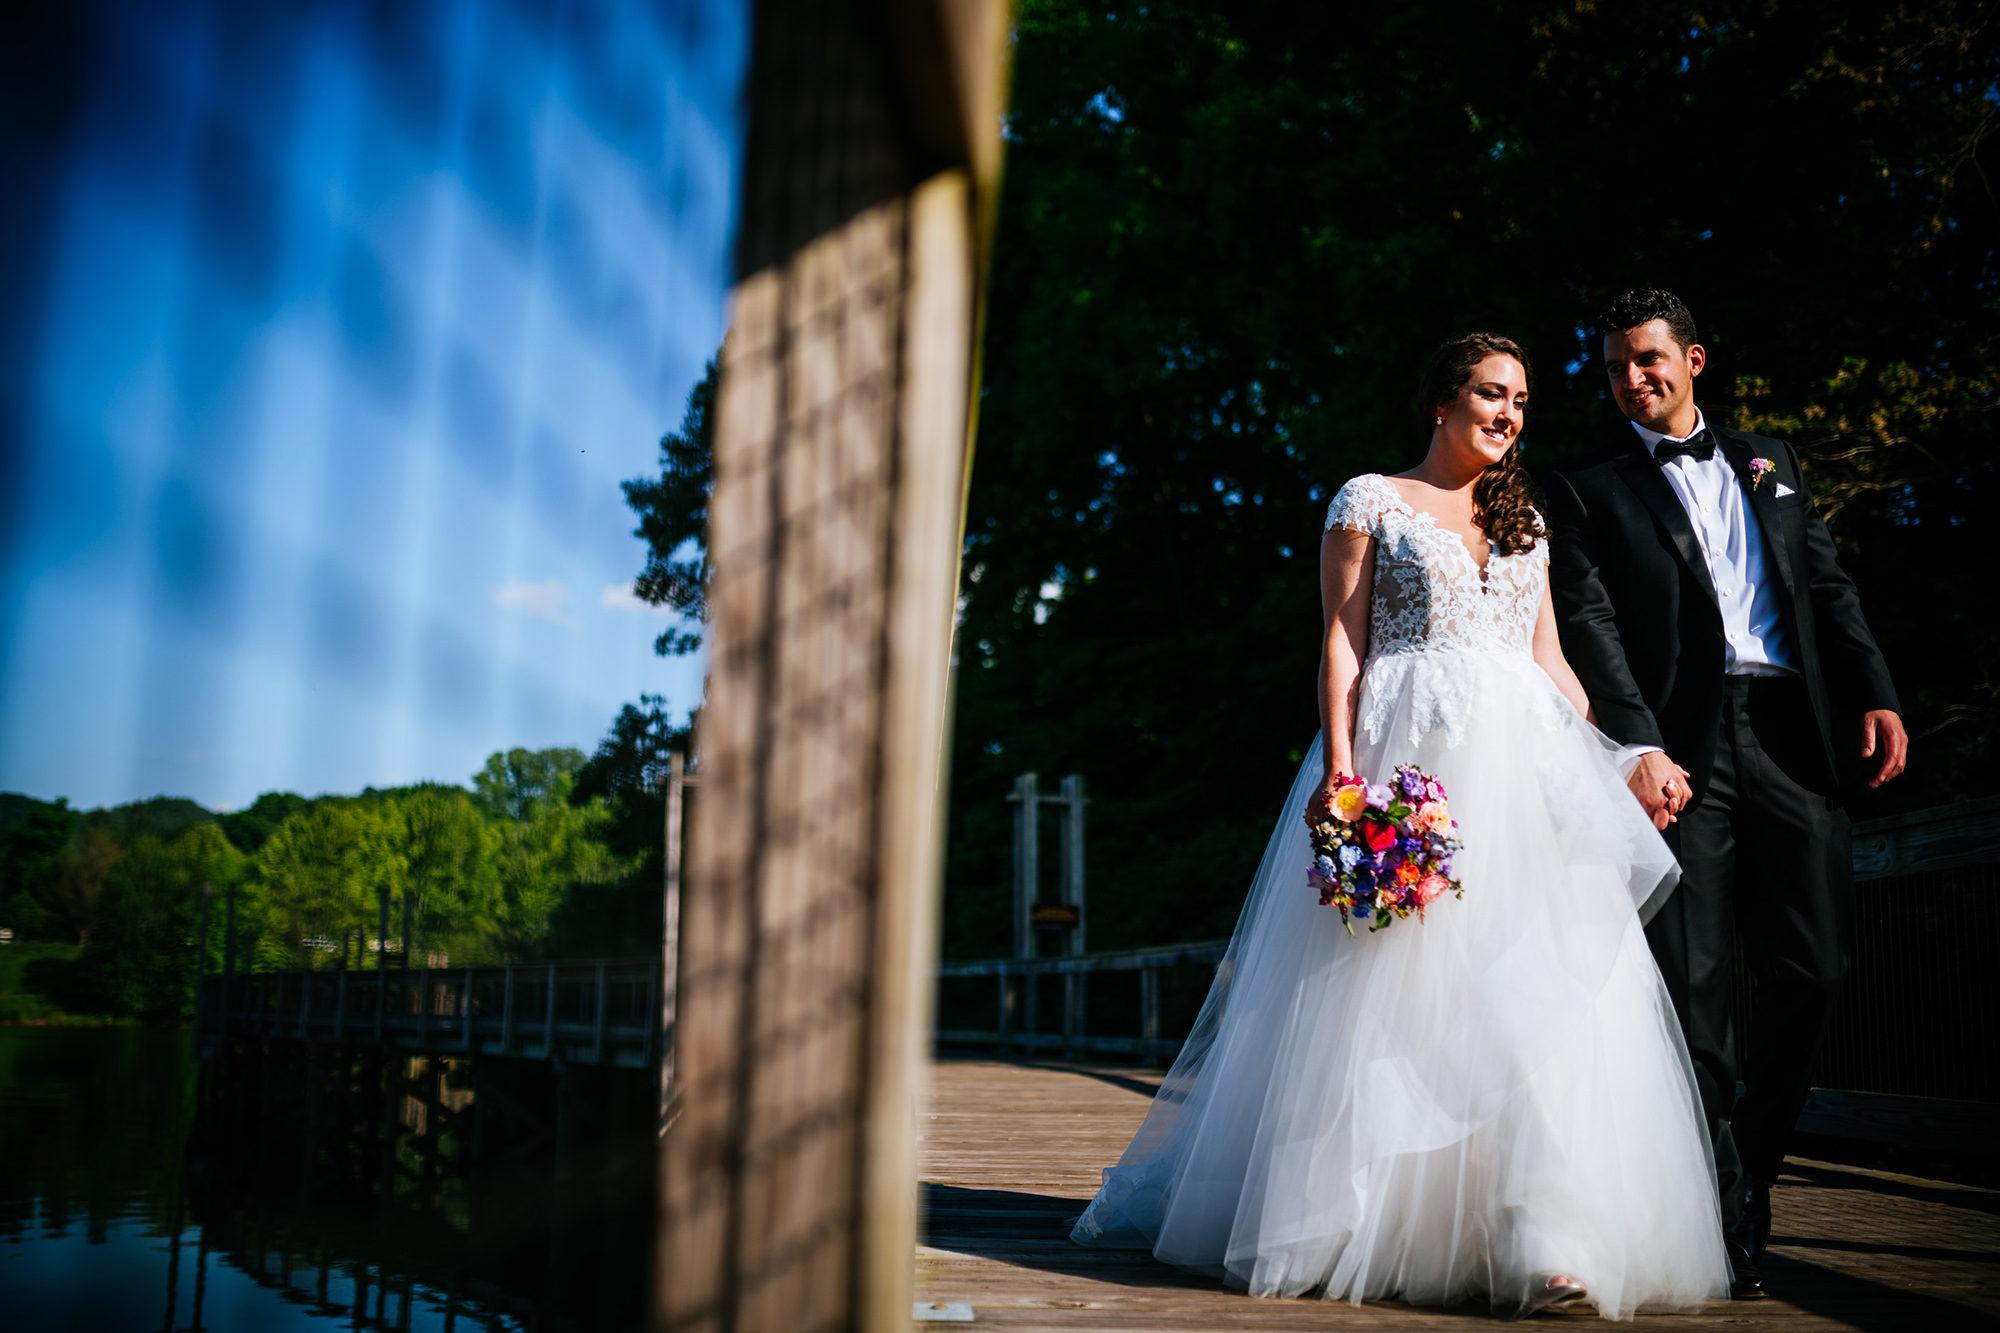 bride groom wedding photo